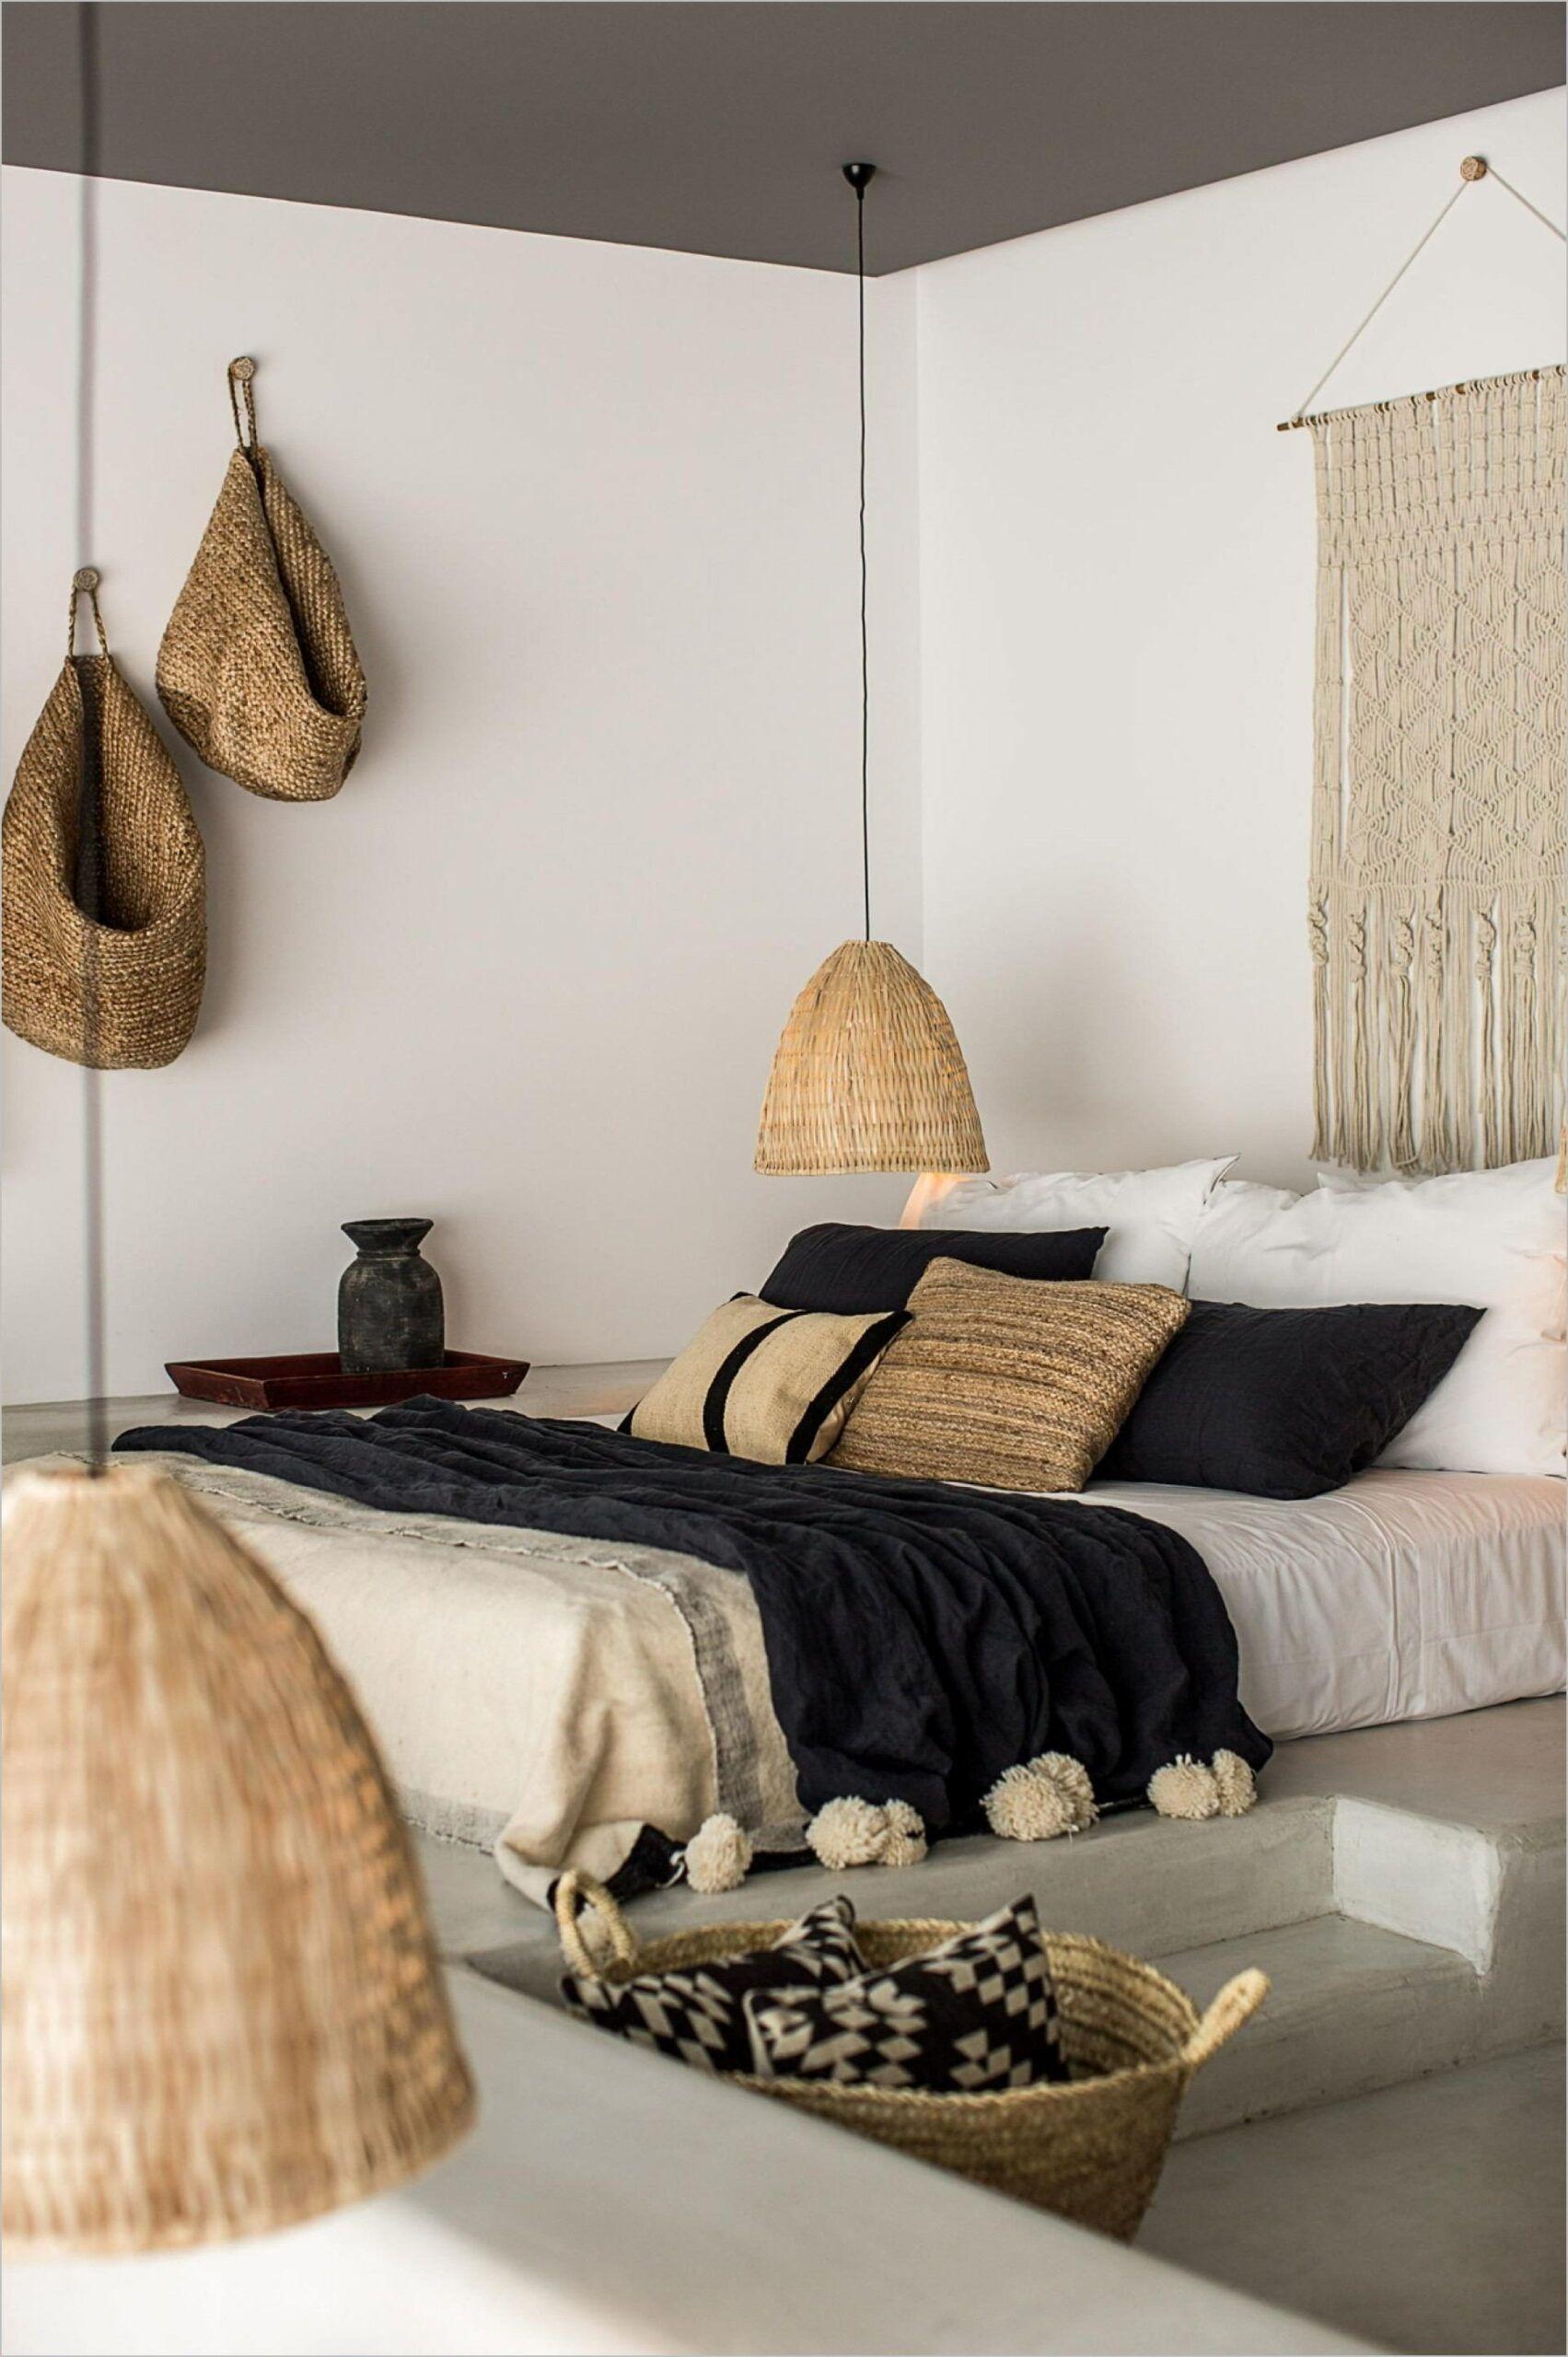 Deco Chambre Noir Et Beige   Bedroom interior, House interior ...